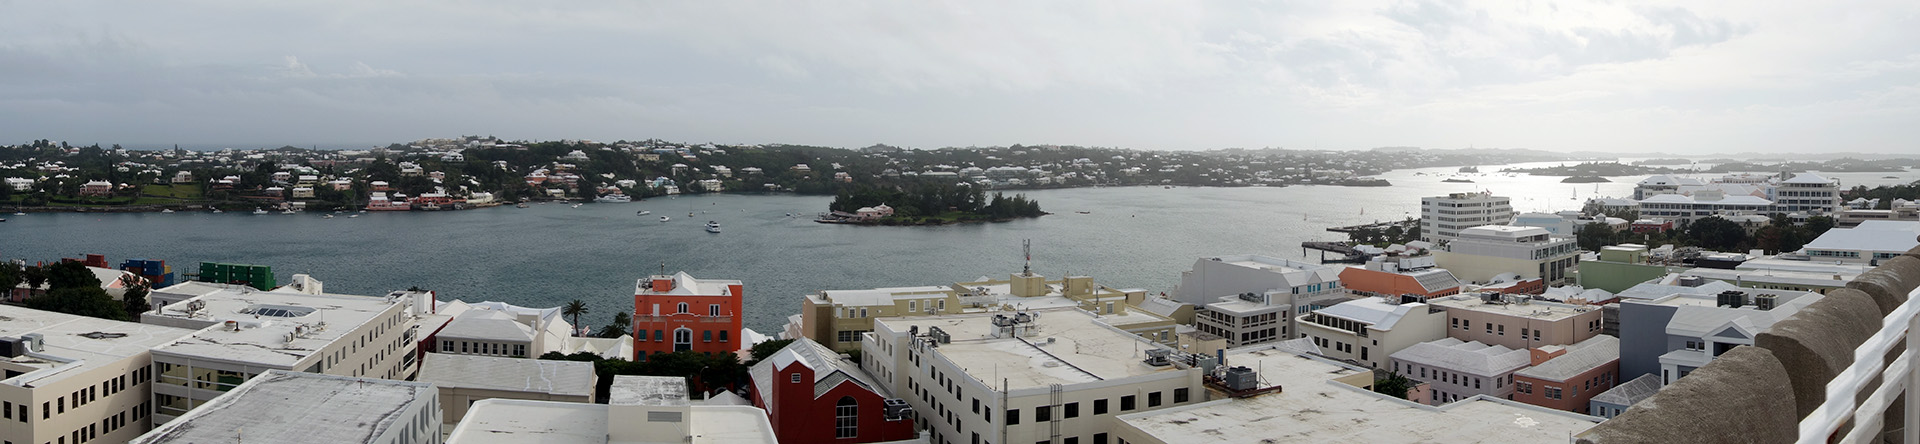 Hamilton harbor, Bermuda.